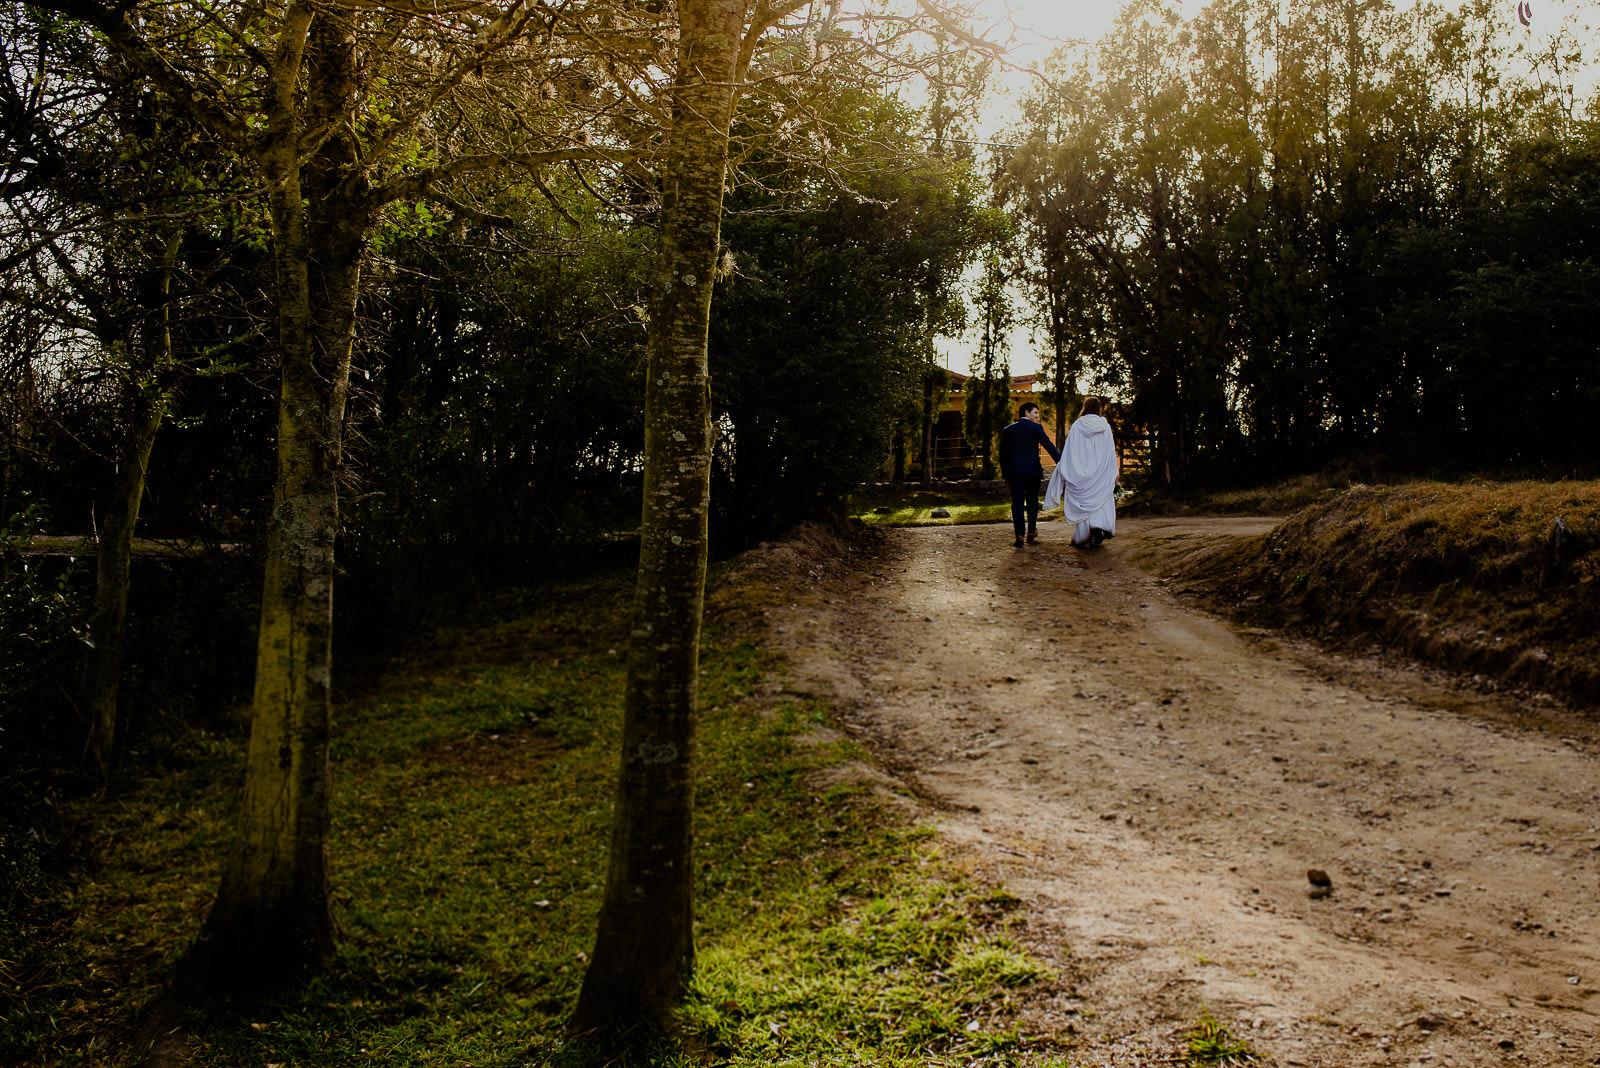 camino del cuadrado Cordoba